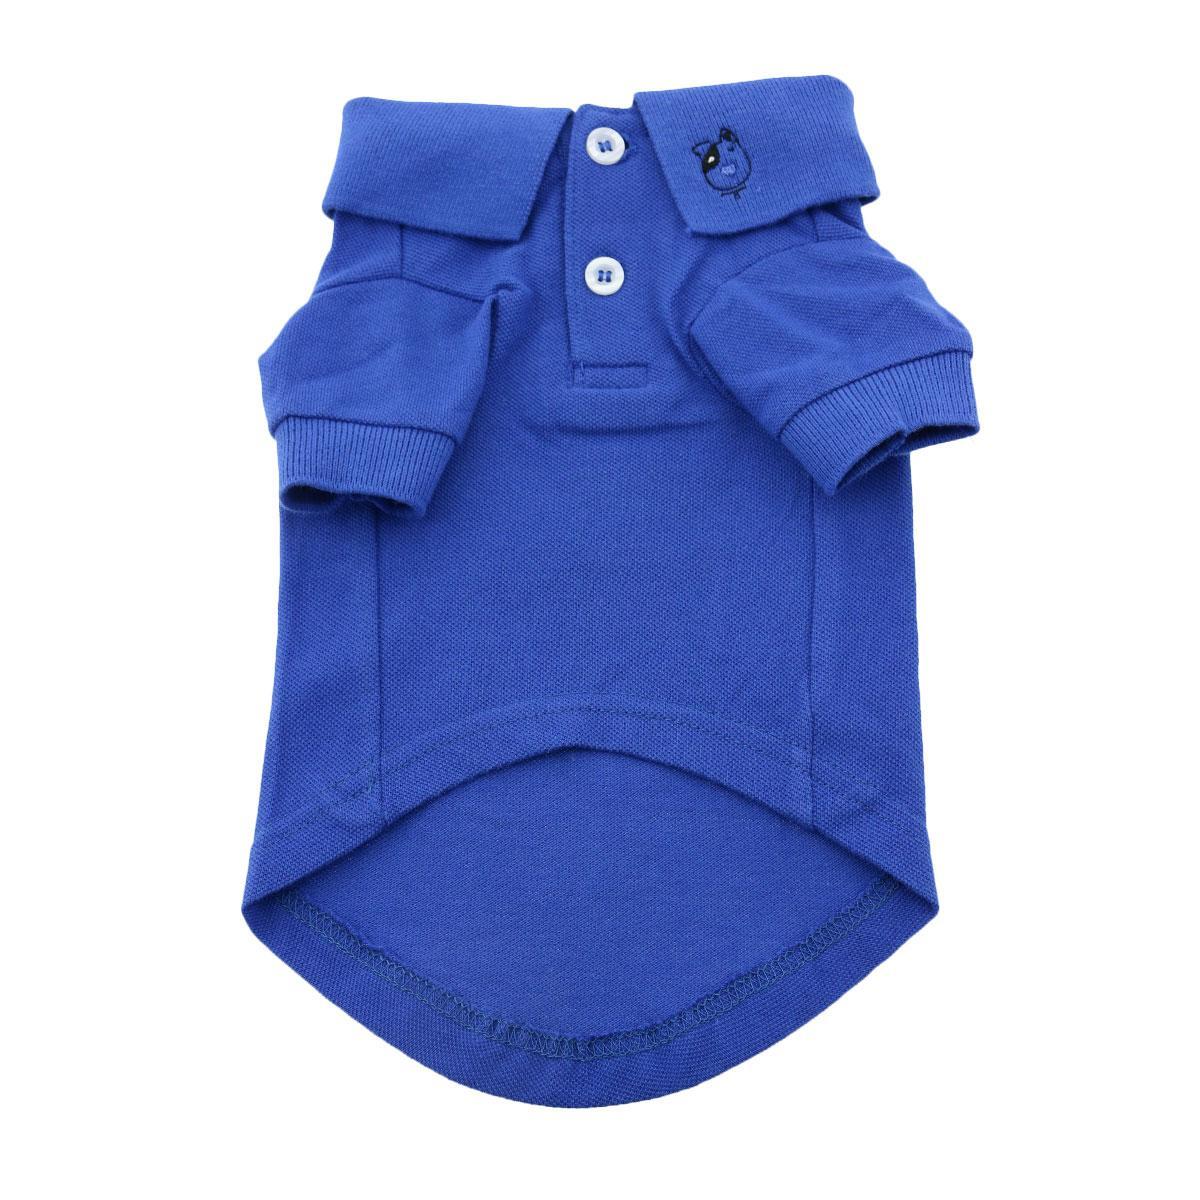 Doggie Design Polo Shirt for Dogs, Solid Nautical Blue, Medium